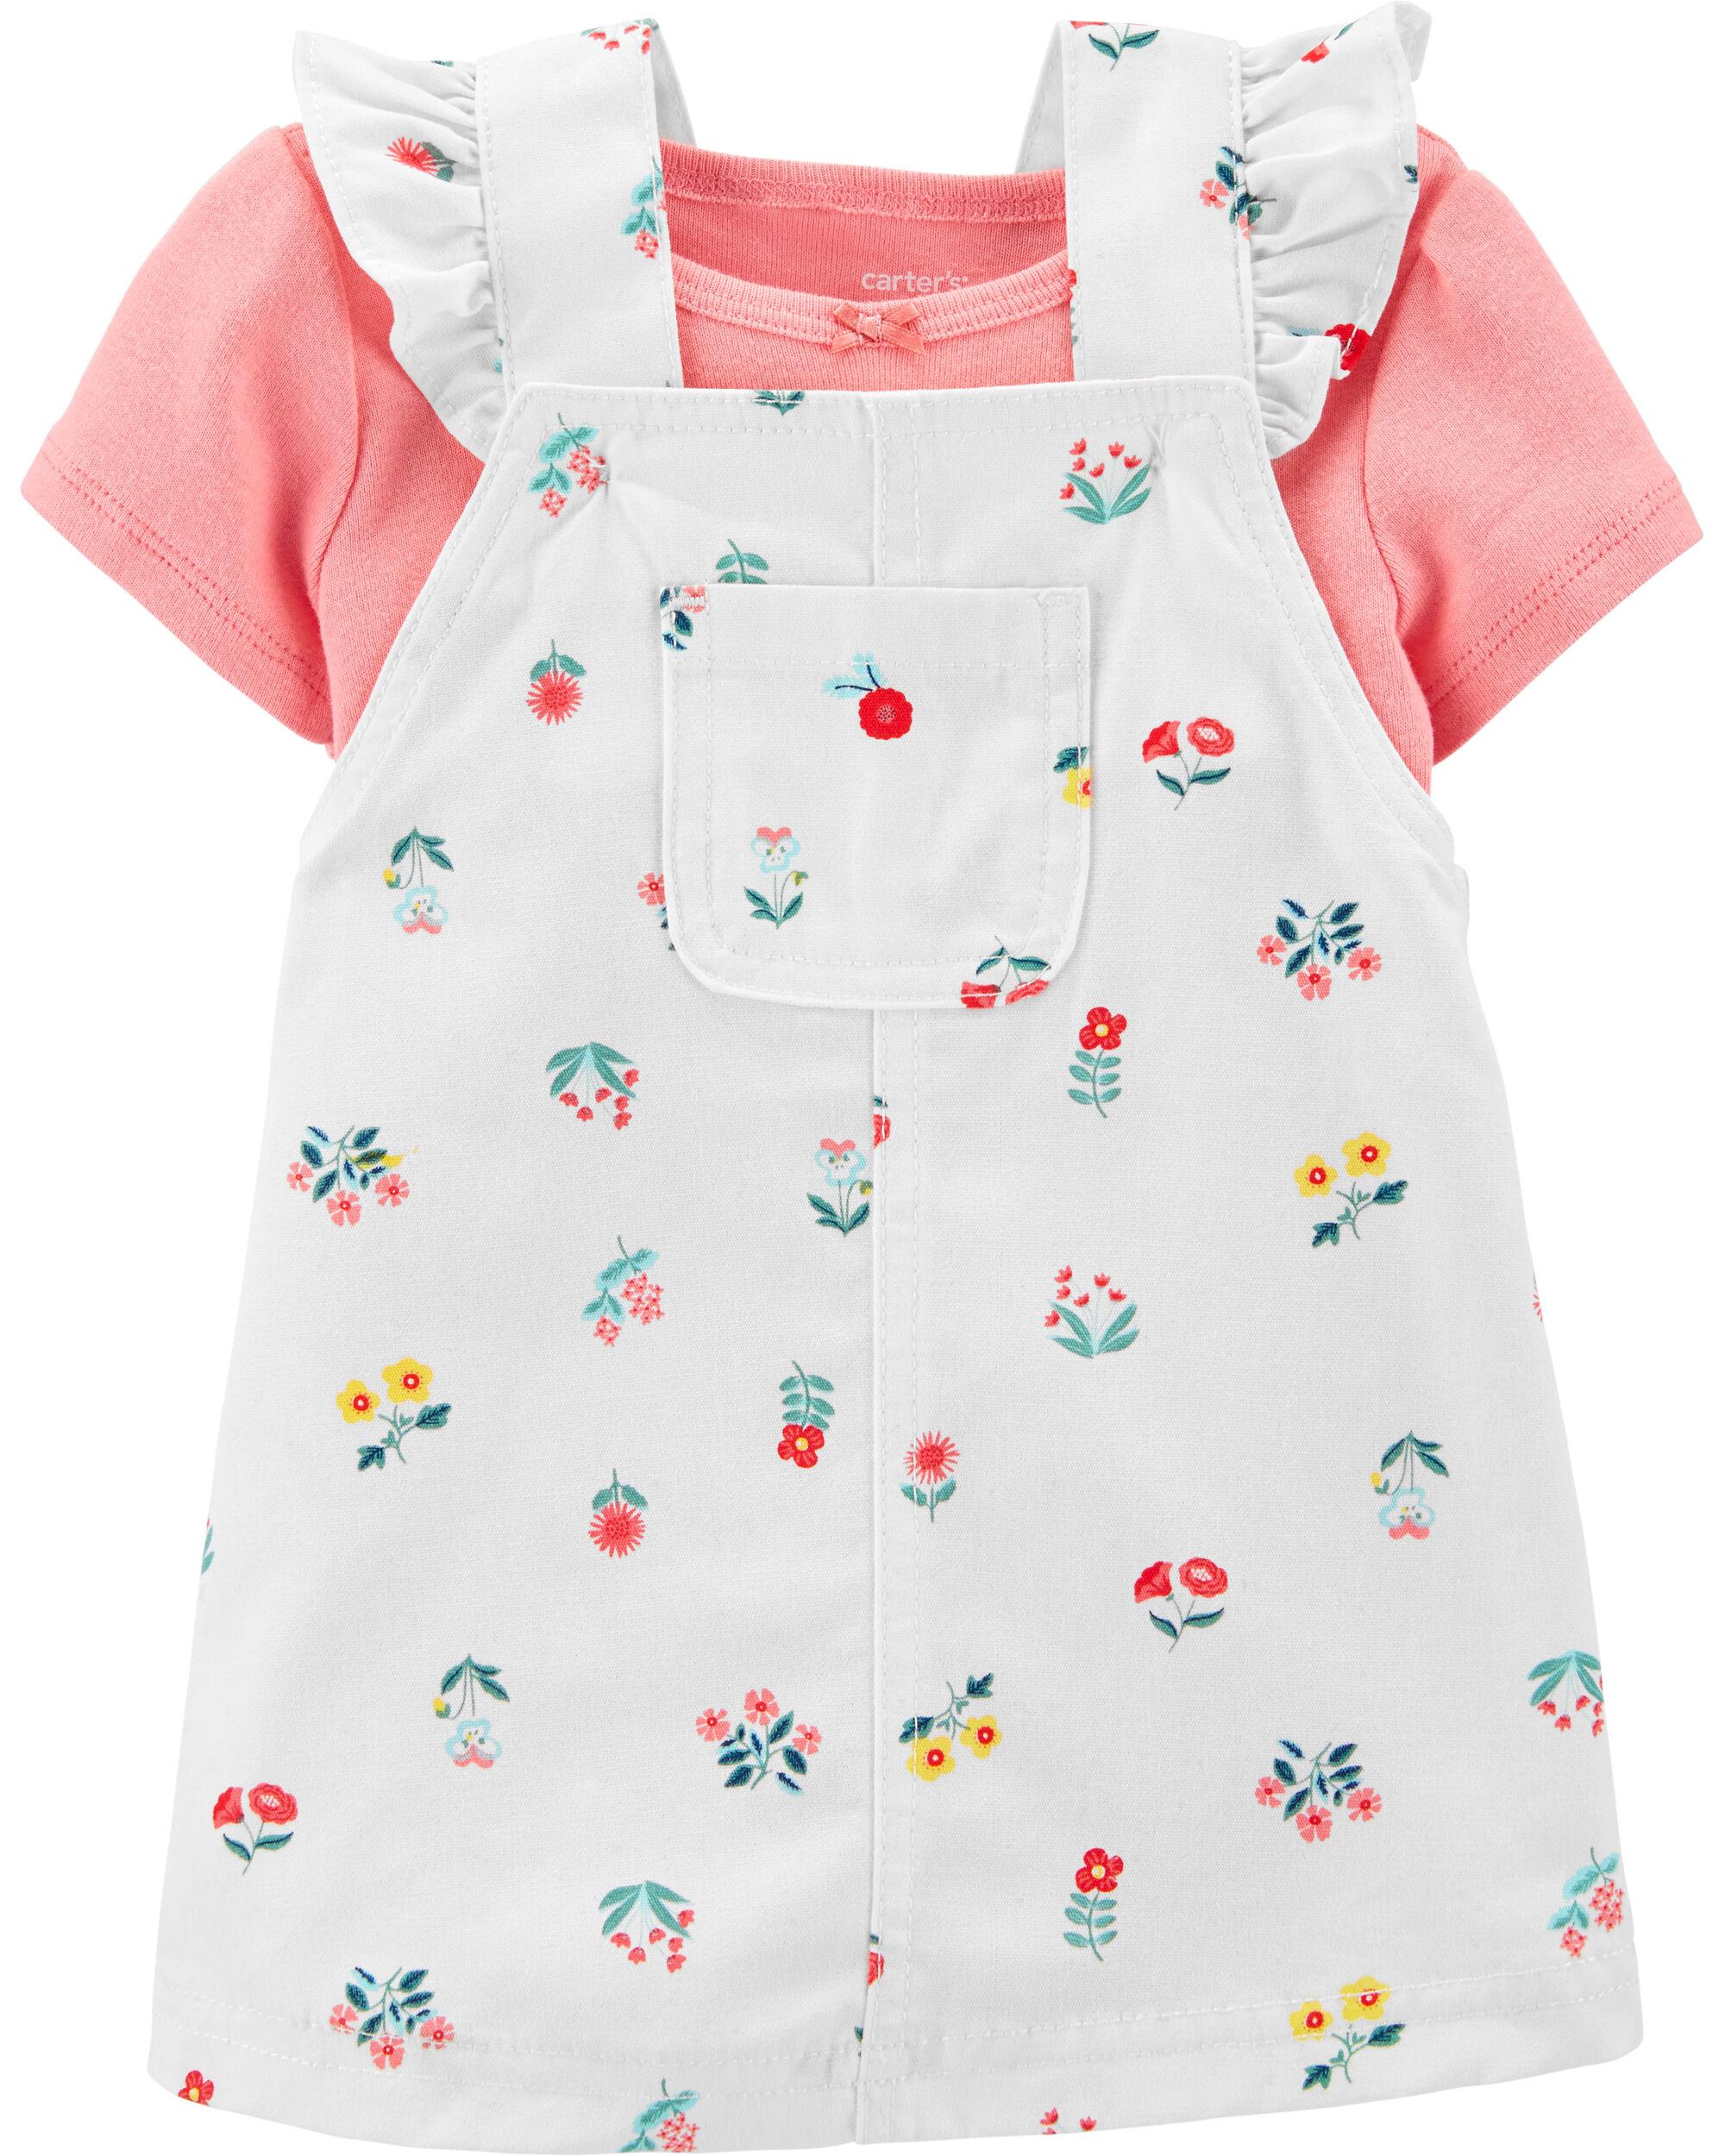 *CLEARANCE* 2-Piece Bodysuit & Floral Skirtall Set